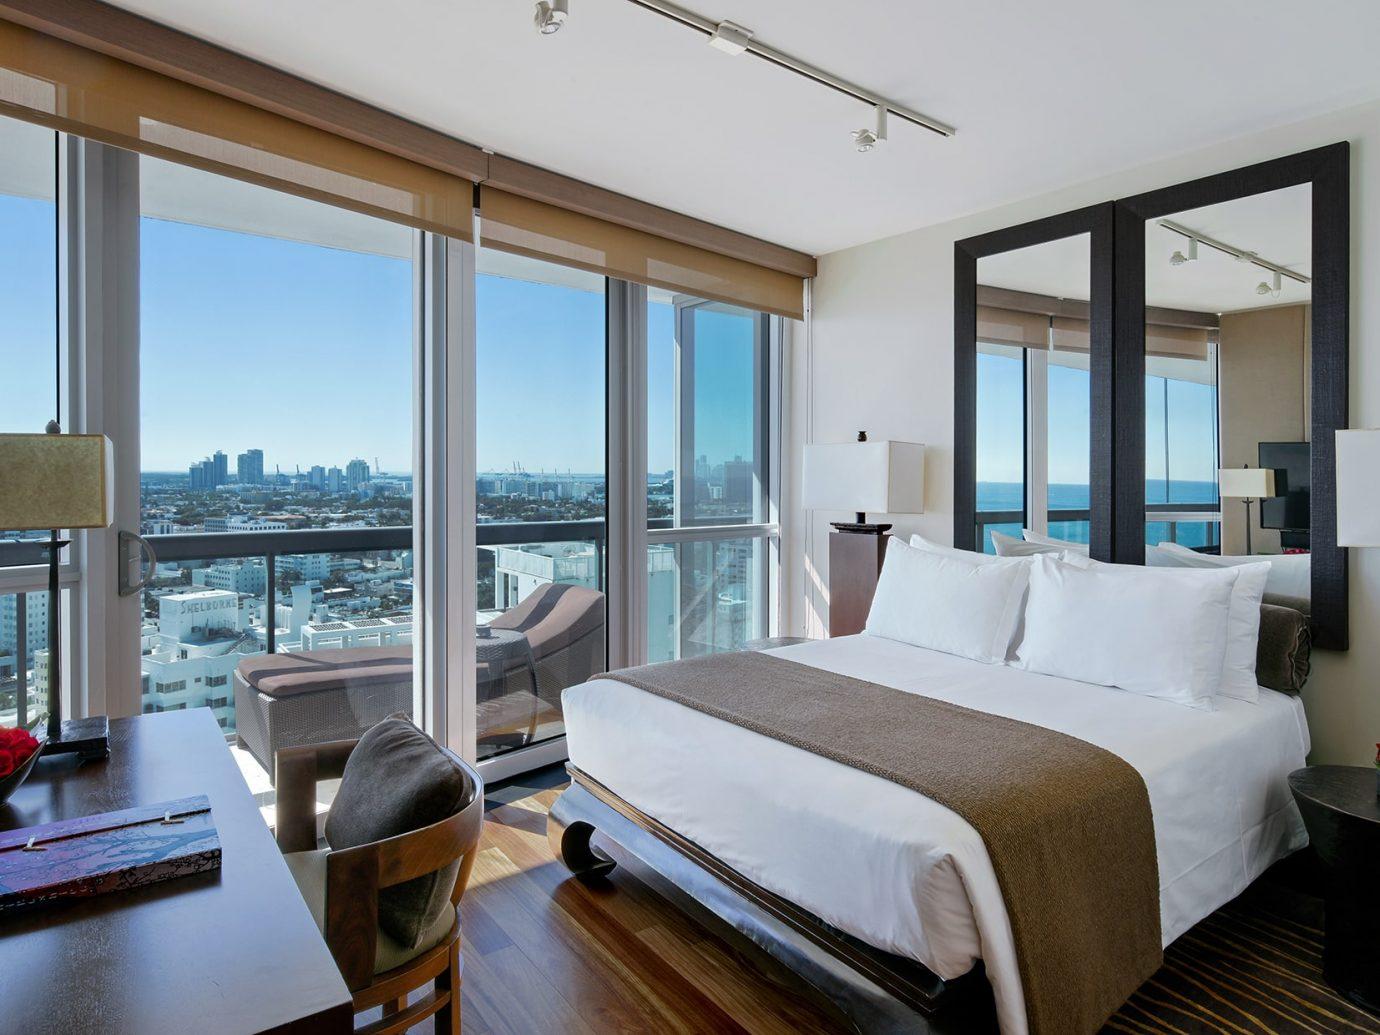 Bedroom at the Setai Miami Beach